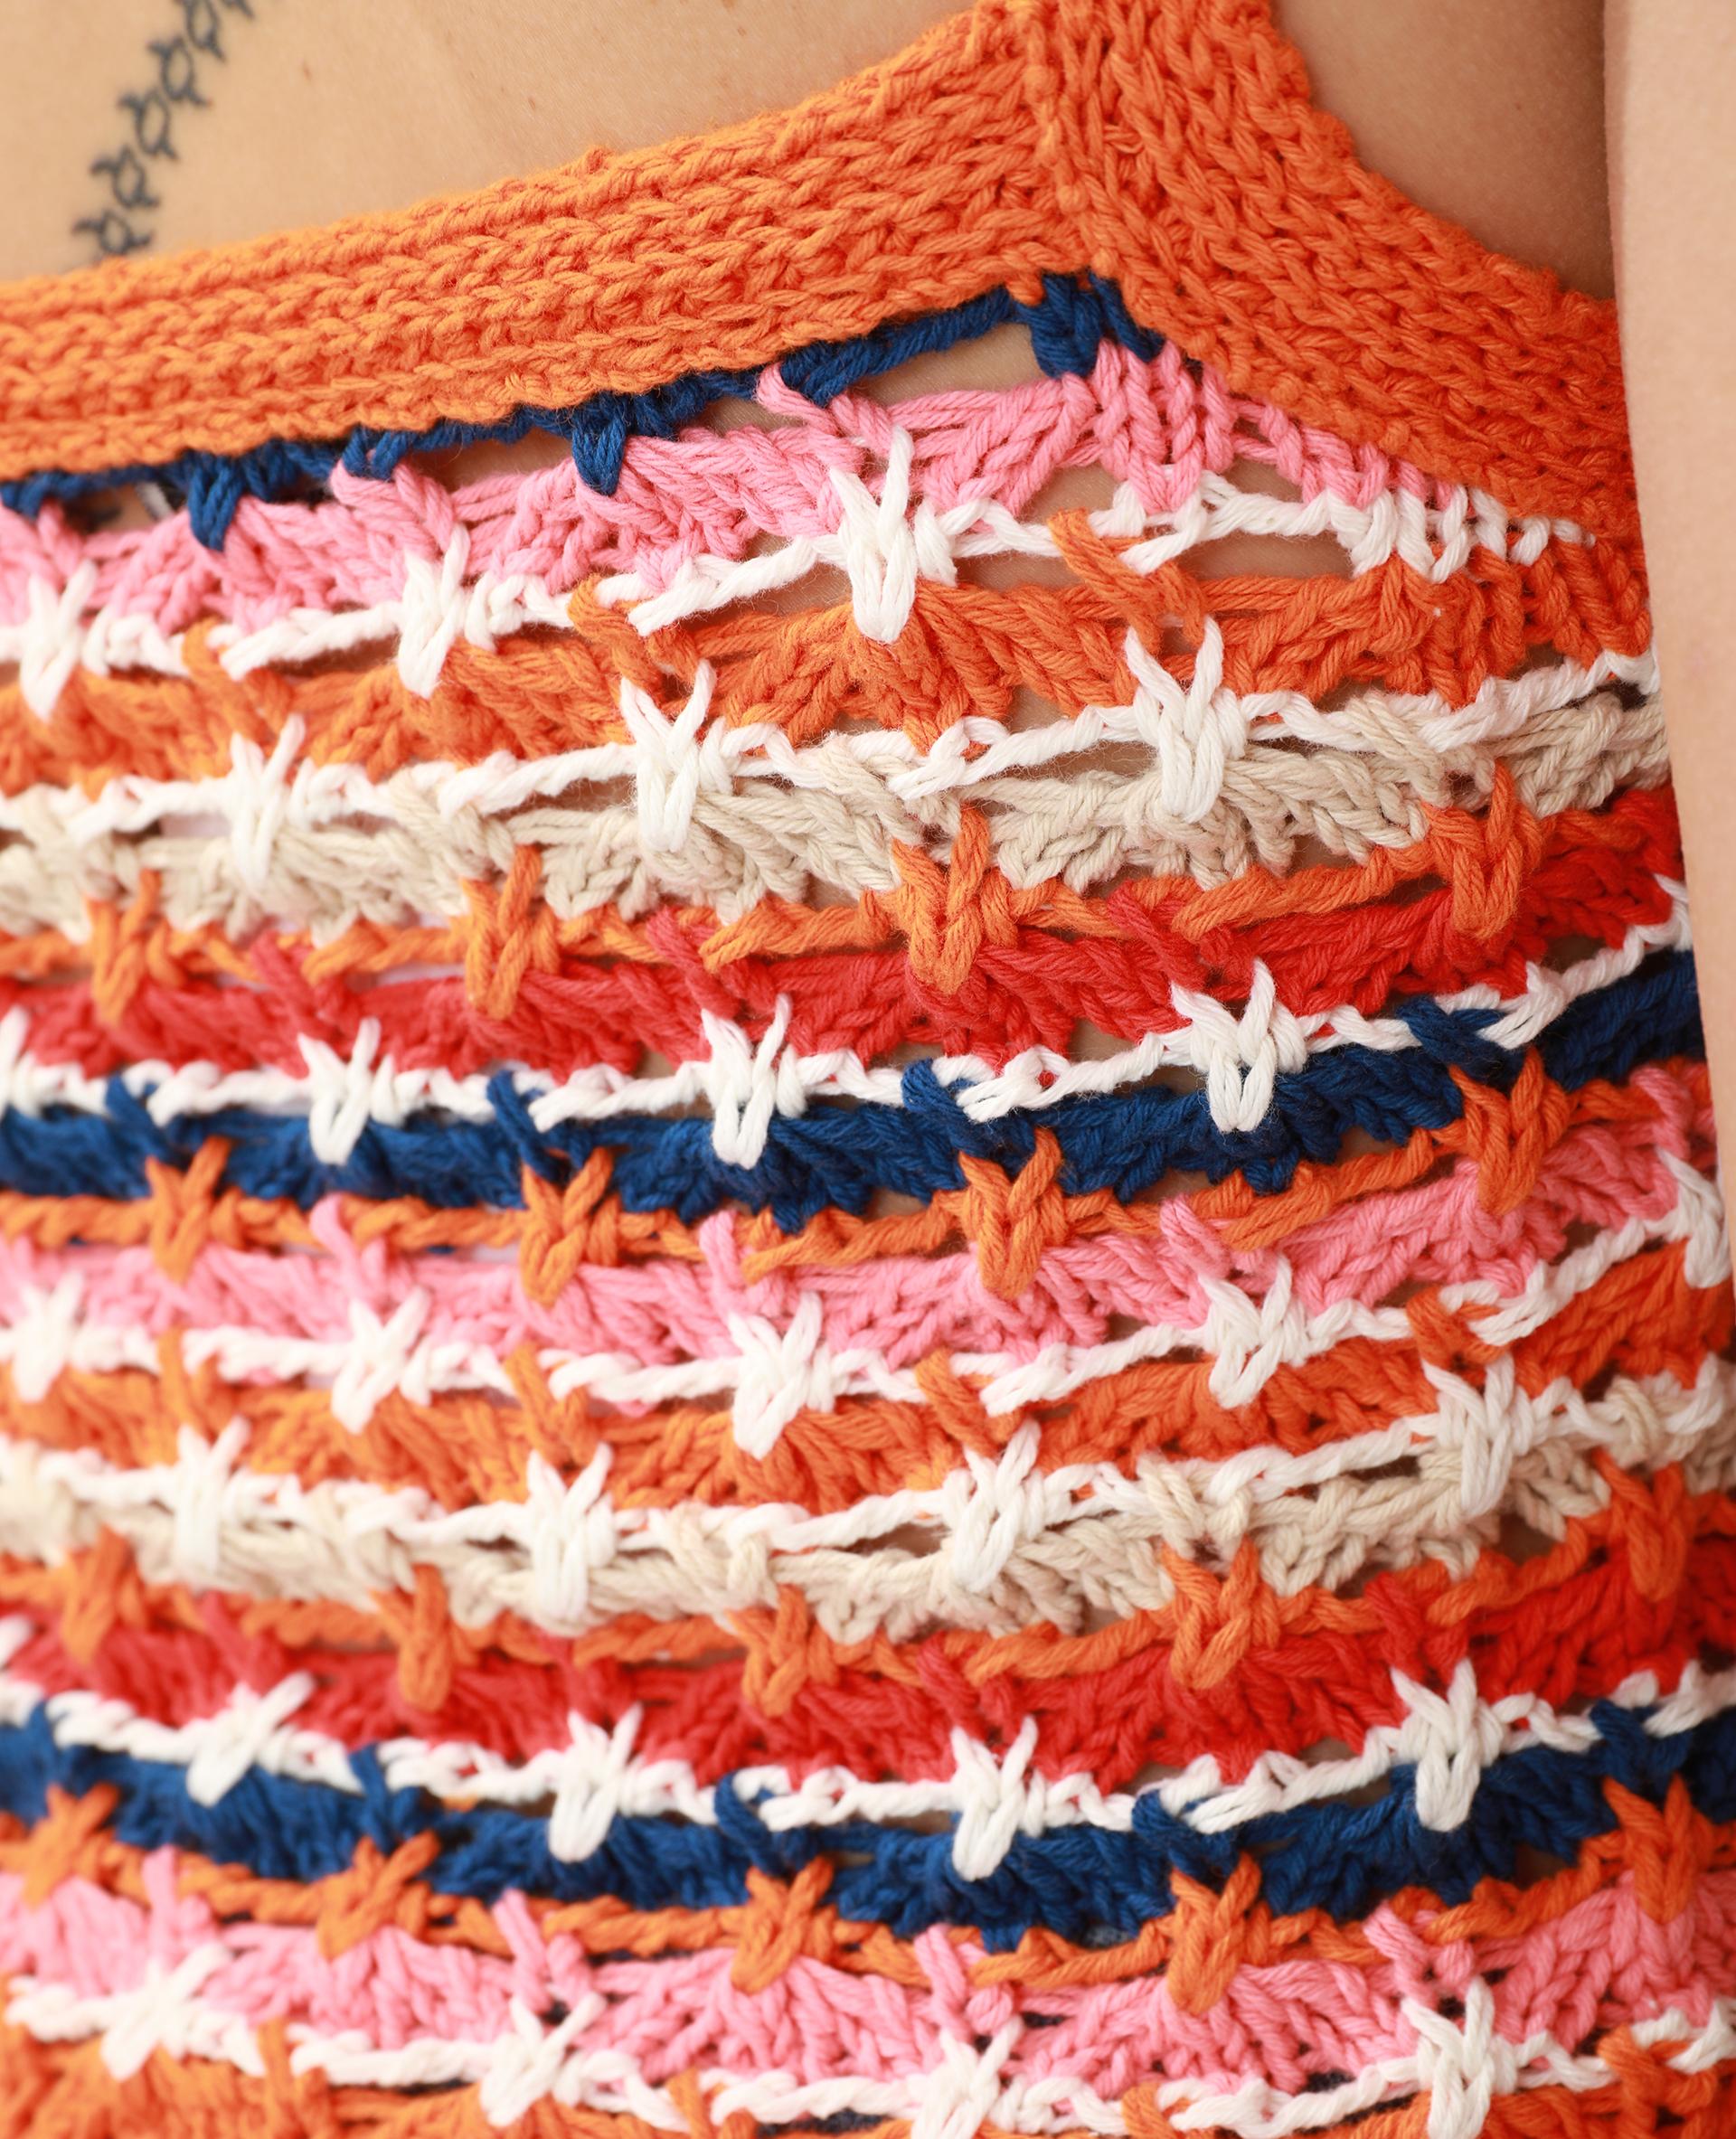 Top en crochet bleu - Pimkie